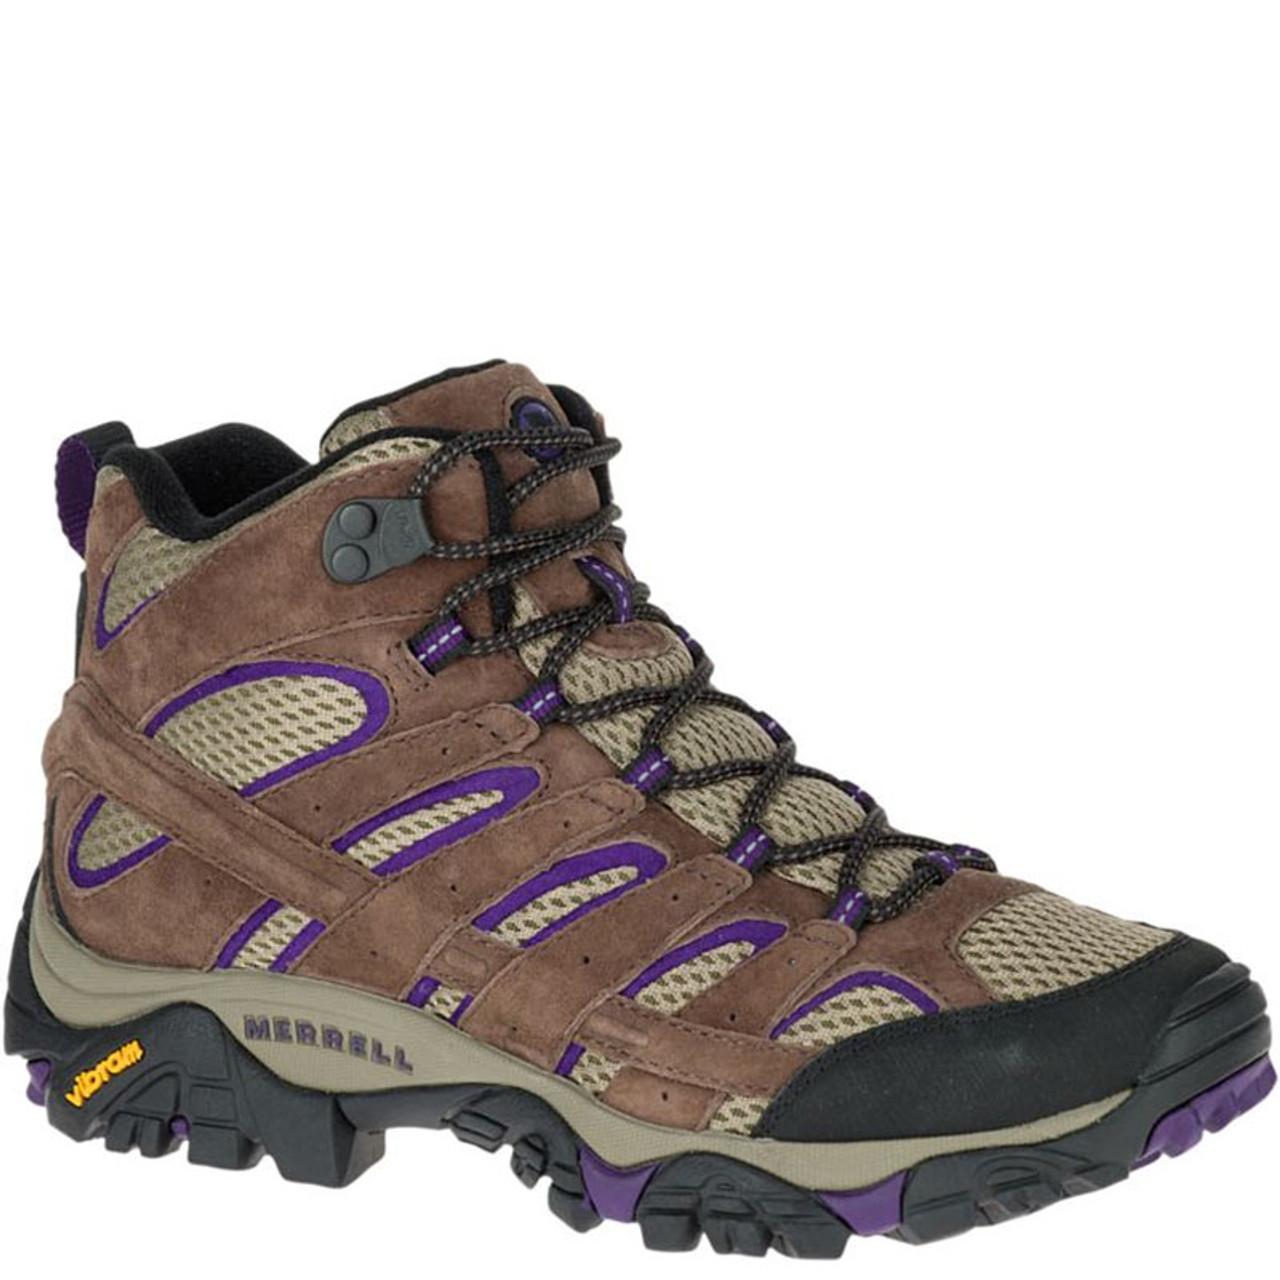 dc45e9ae Merrell J06050 Women's MOAB 2 VENTILATOR Mid Hiking Boots Bracken Purple